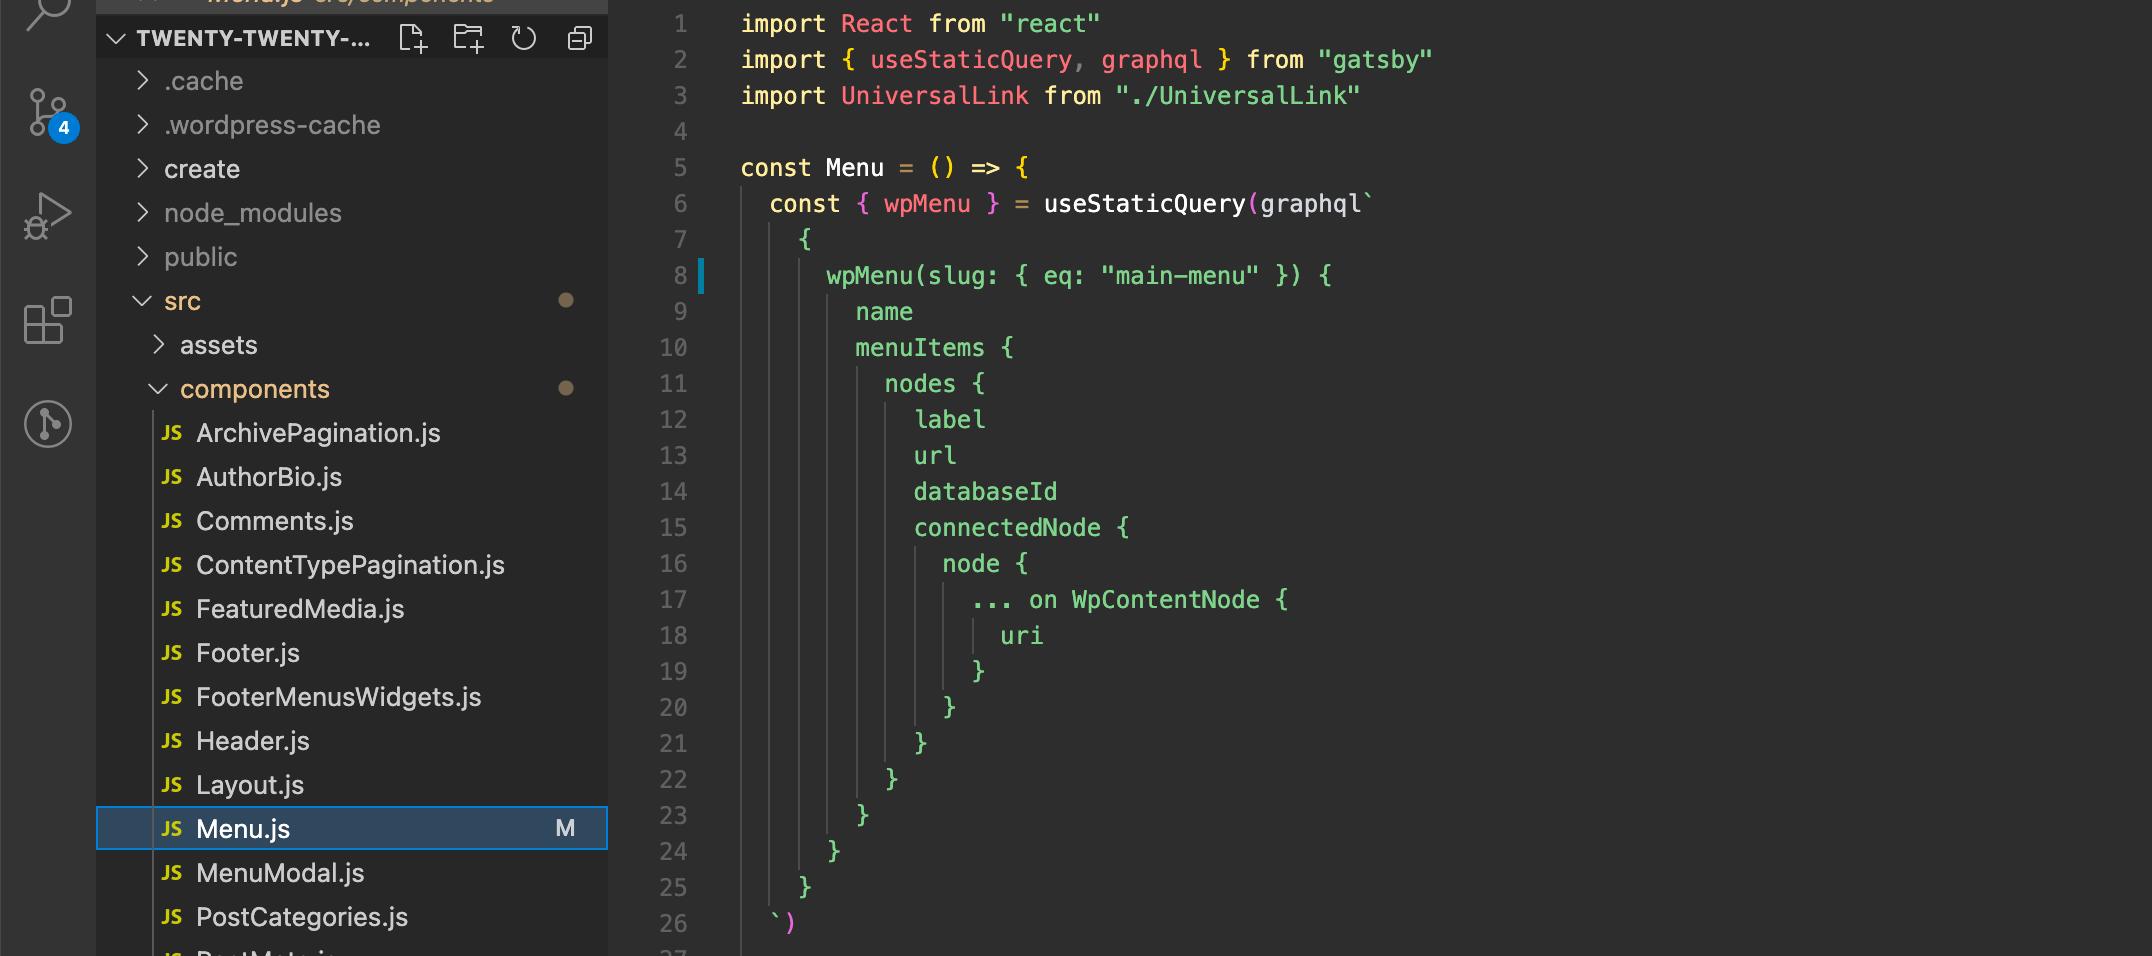 "Screenshot showing Menu.js file with changed menu slug to ""main-menu"" in line 8."